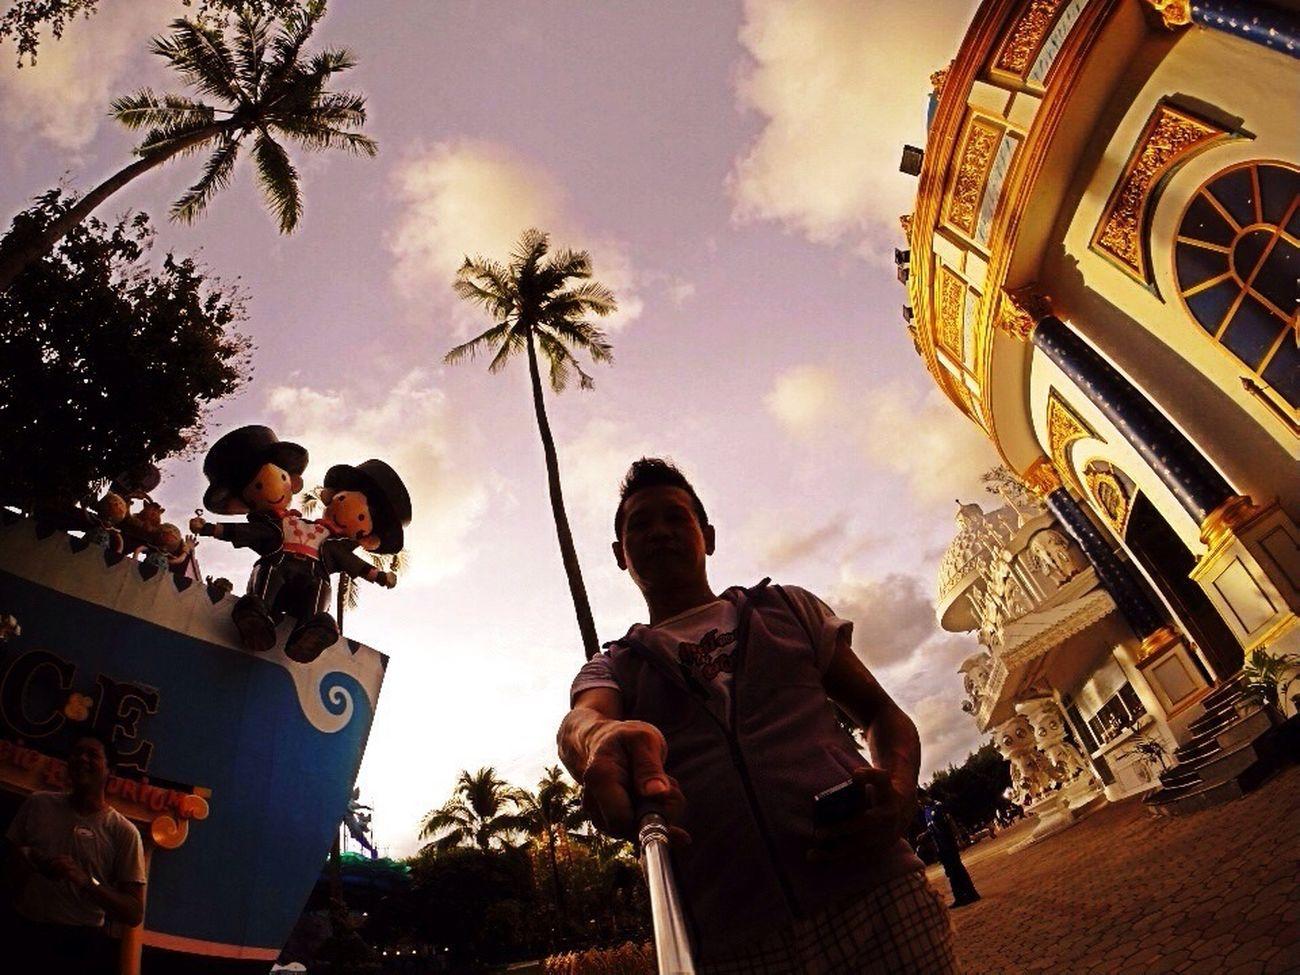 Enjoying Life HDR Selfportrait GoPro Hero3+ Hdr Photography